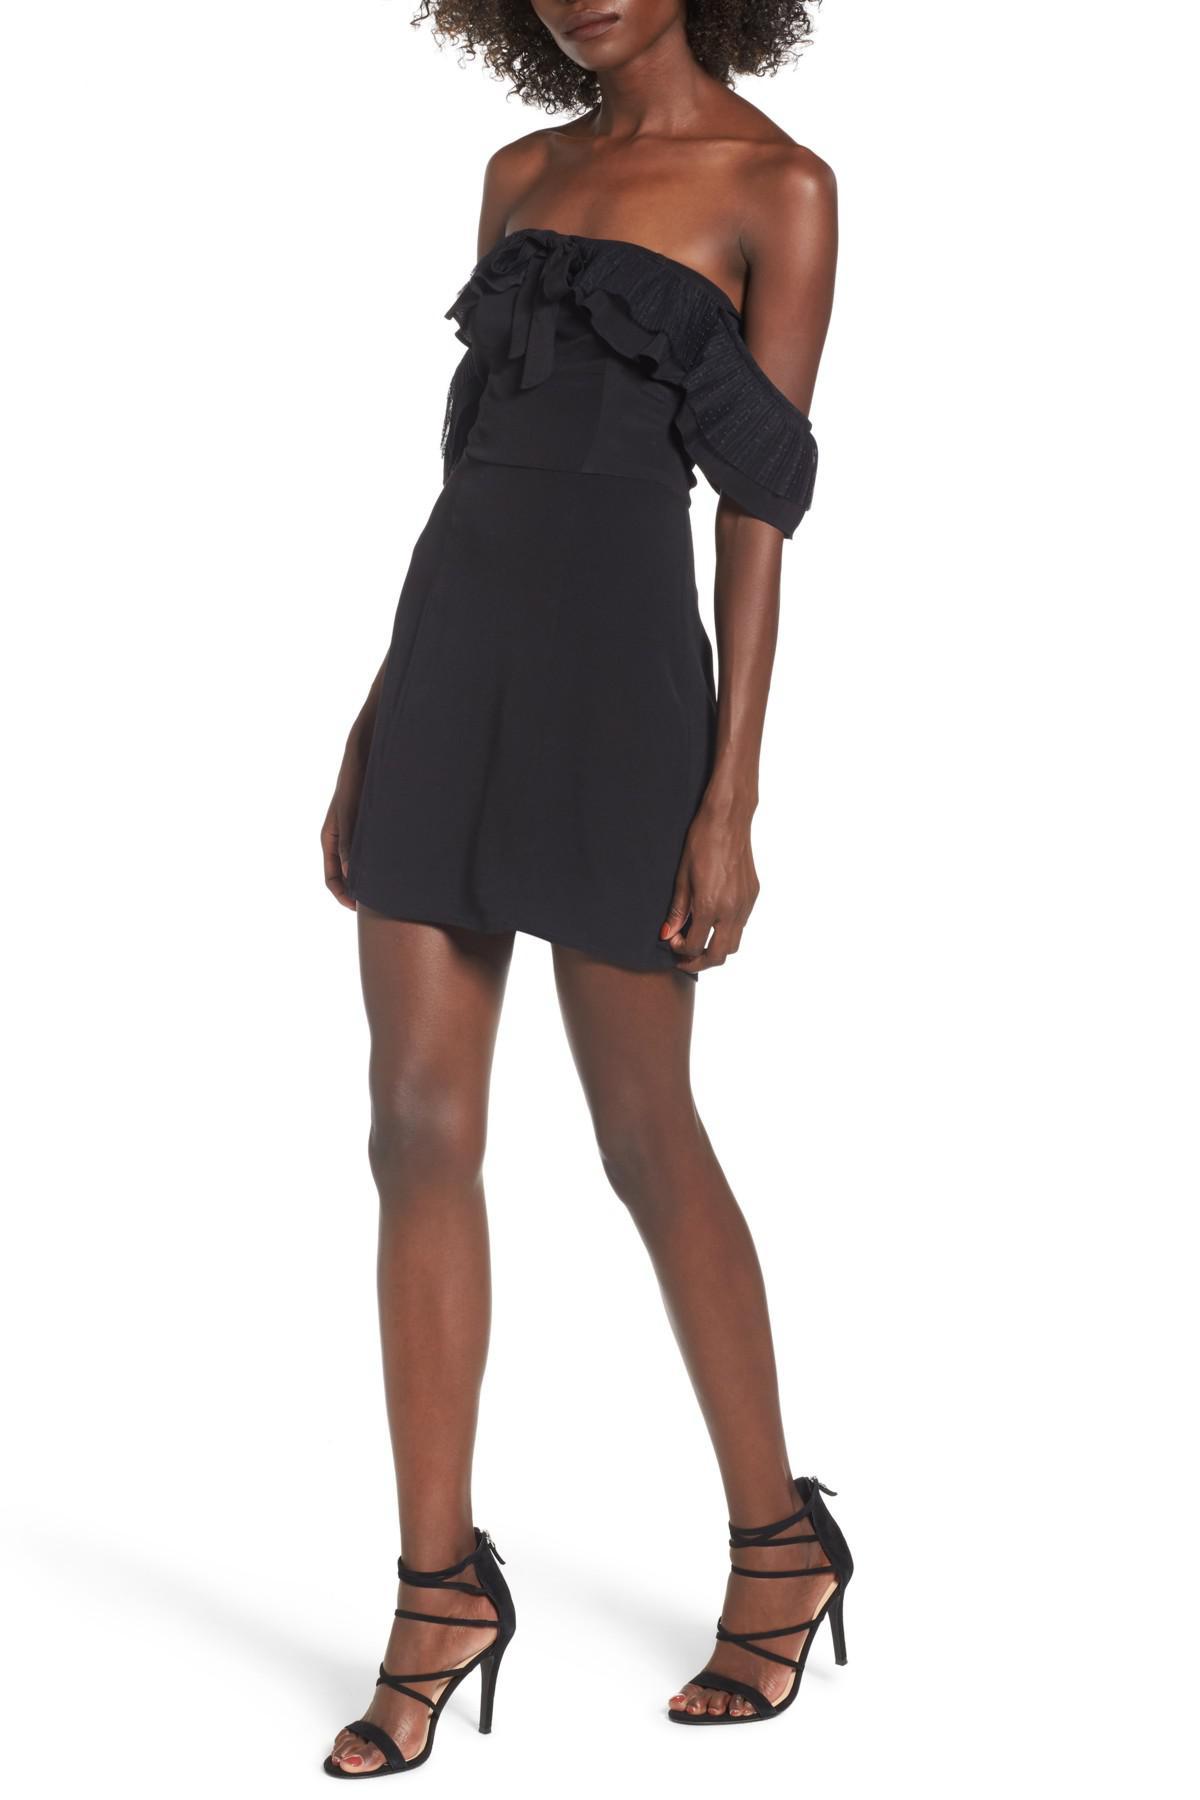 3f2d1541c443 Lyst - For Love & Lemons Claire Off-the-shoulder Minidress in Black